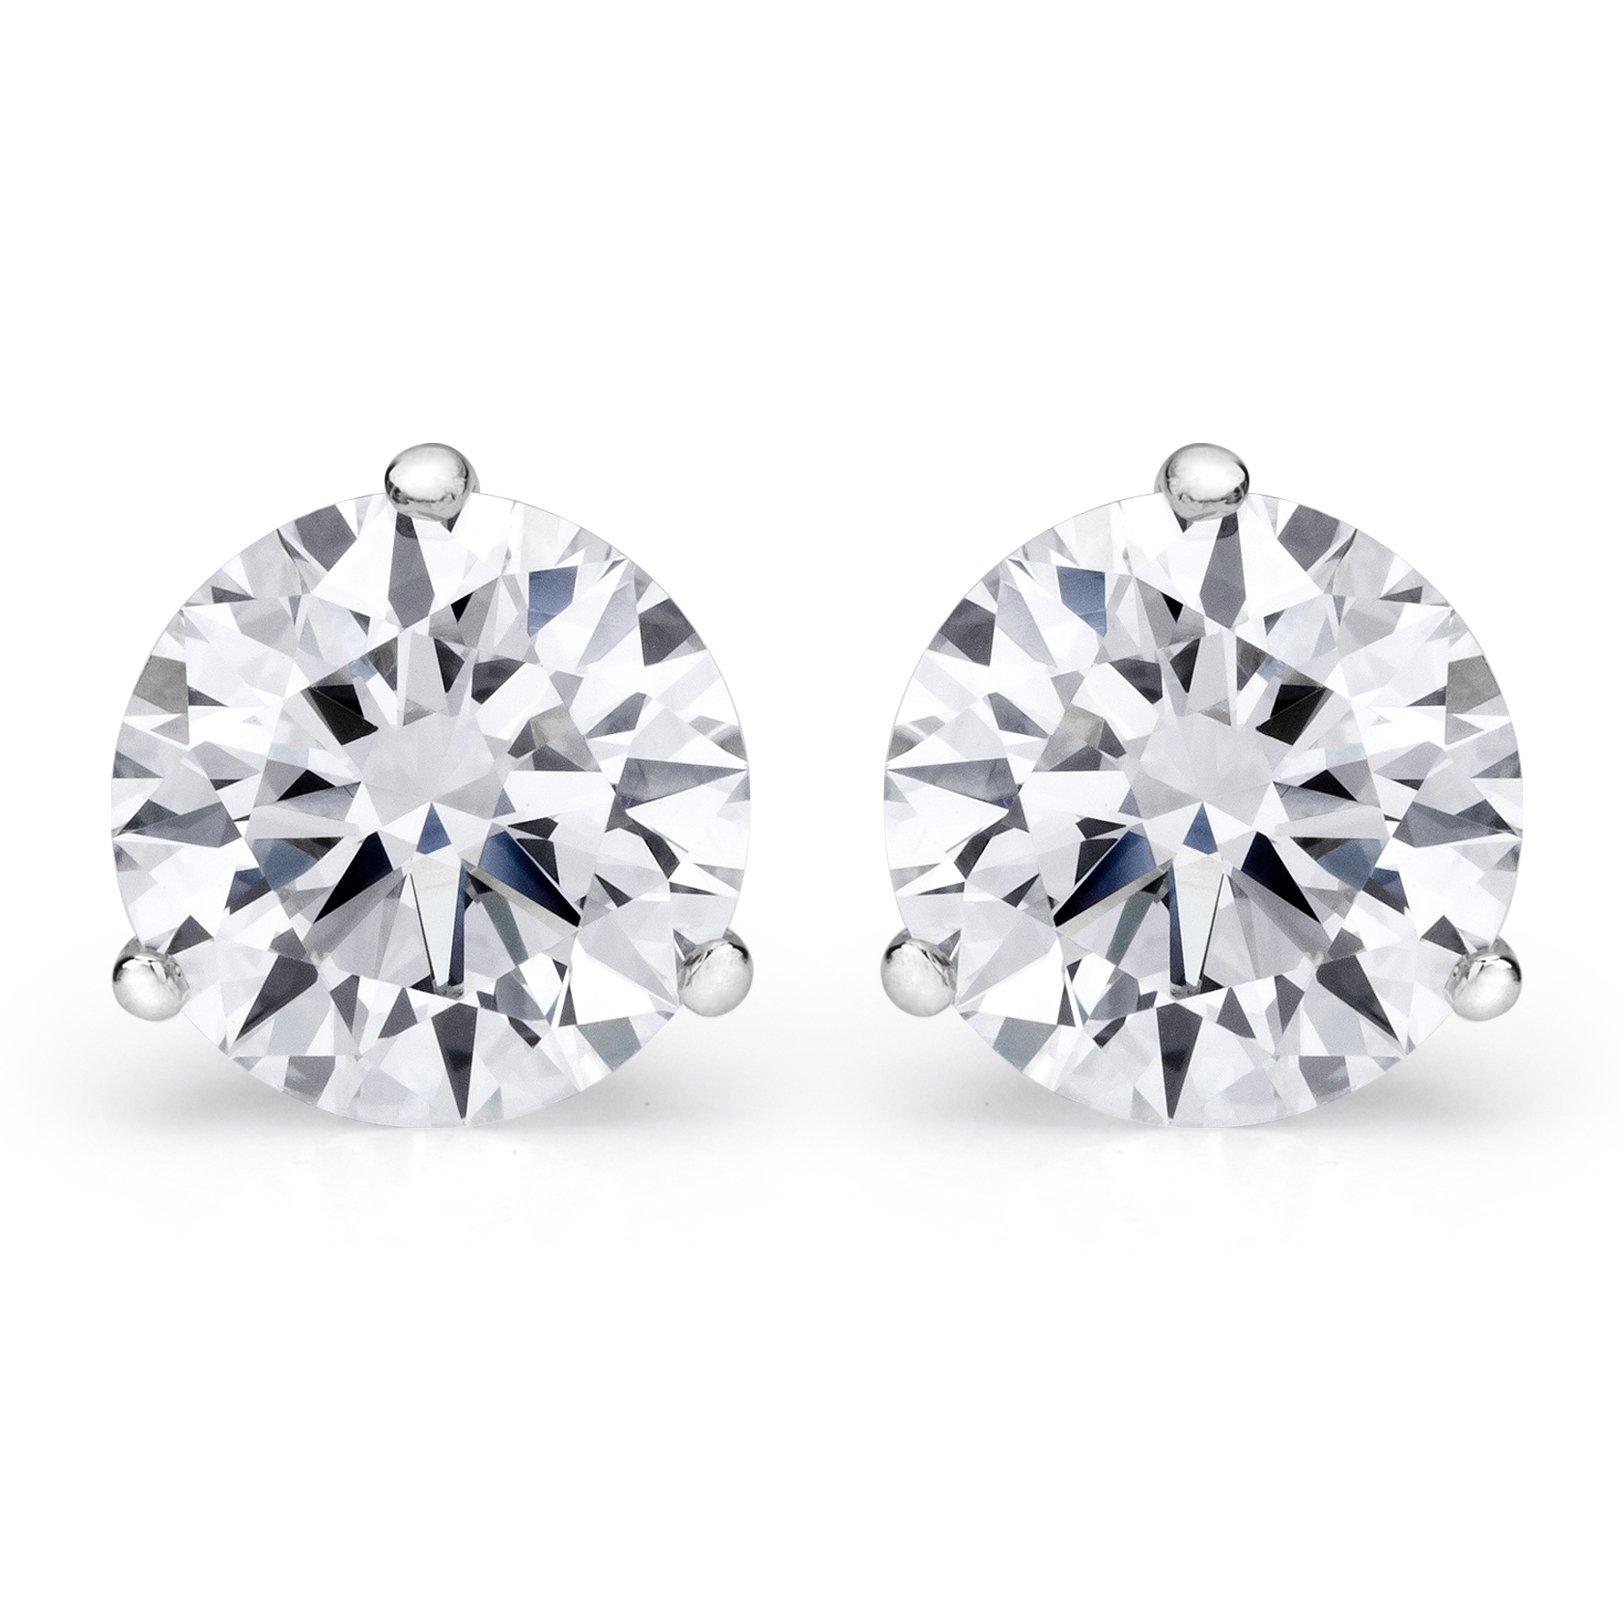 2 Carat IGI Certified Round Diamond Stud Earrings Platinum 3 Prong Push Back J-K SI1-SI2